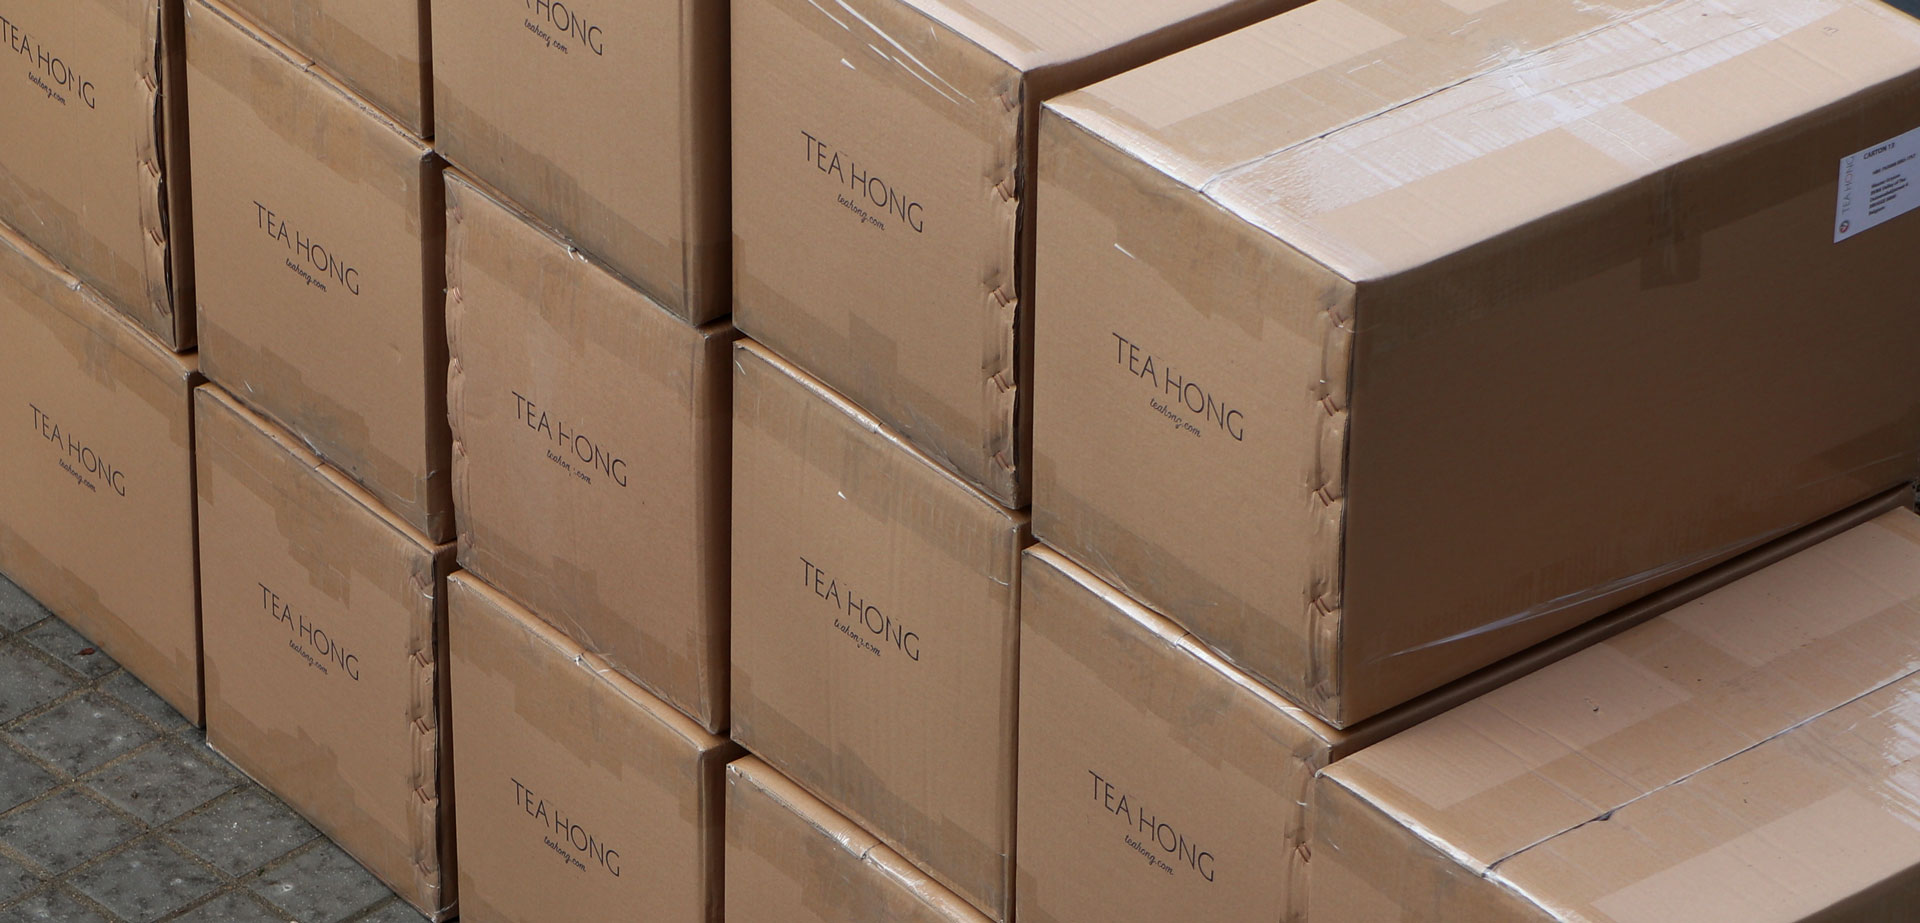 Tea Hong Shipping Cartons